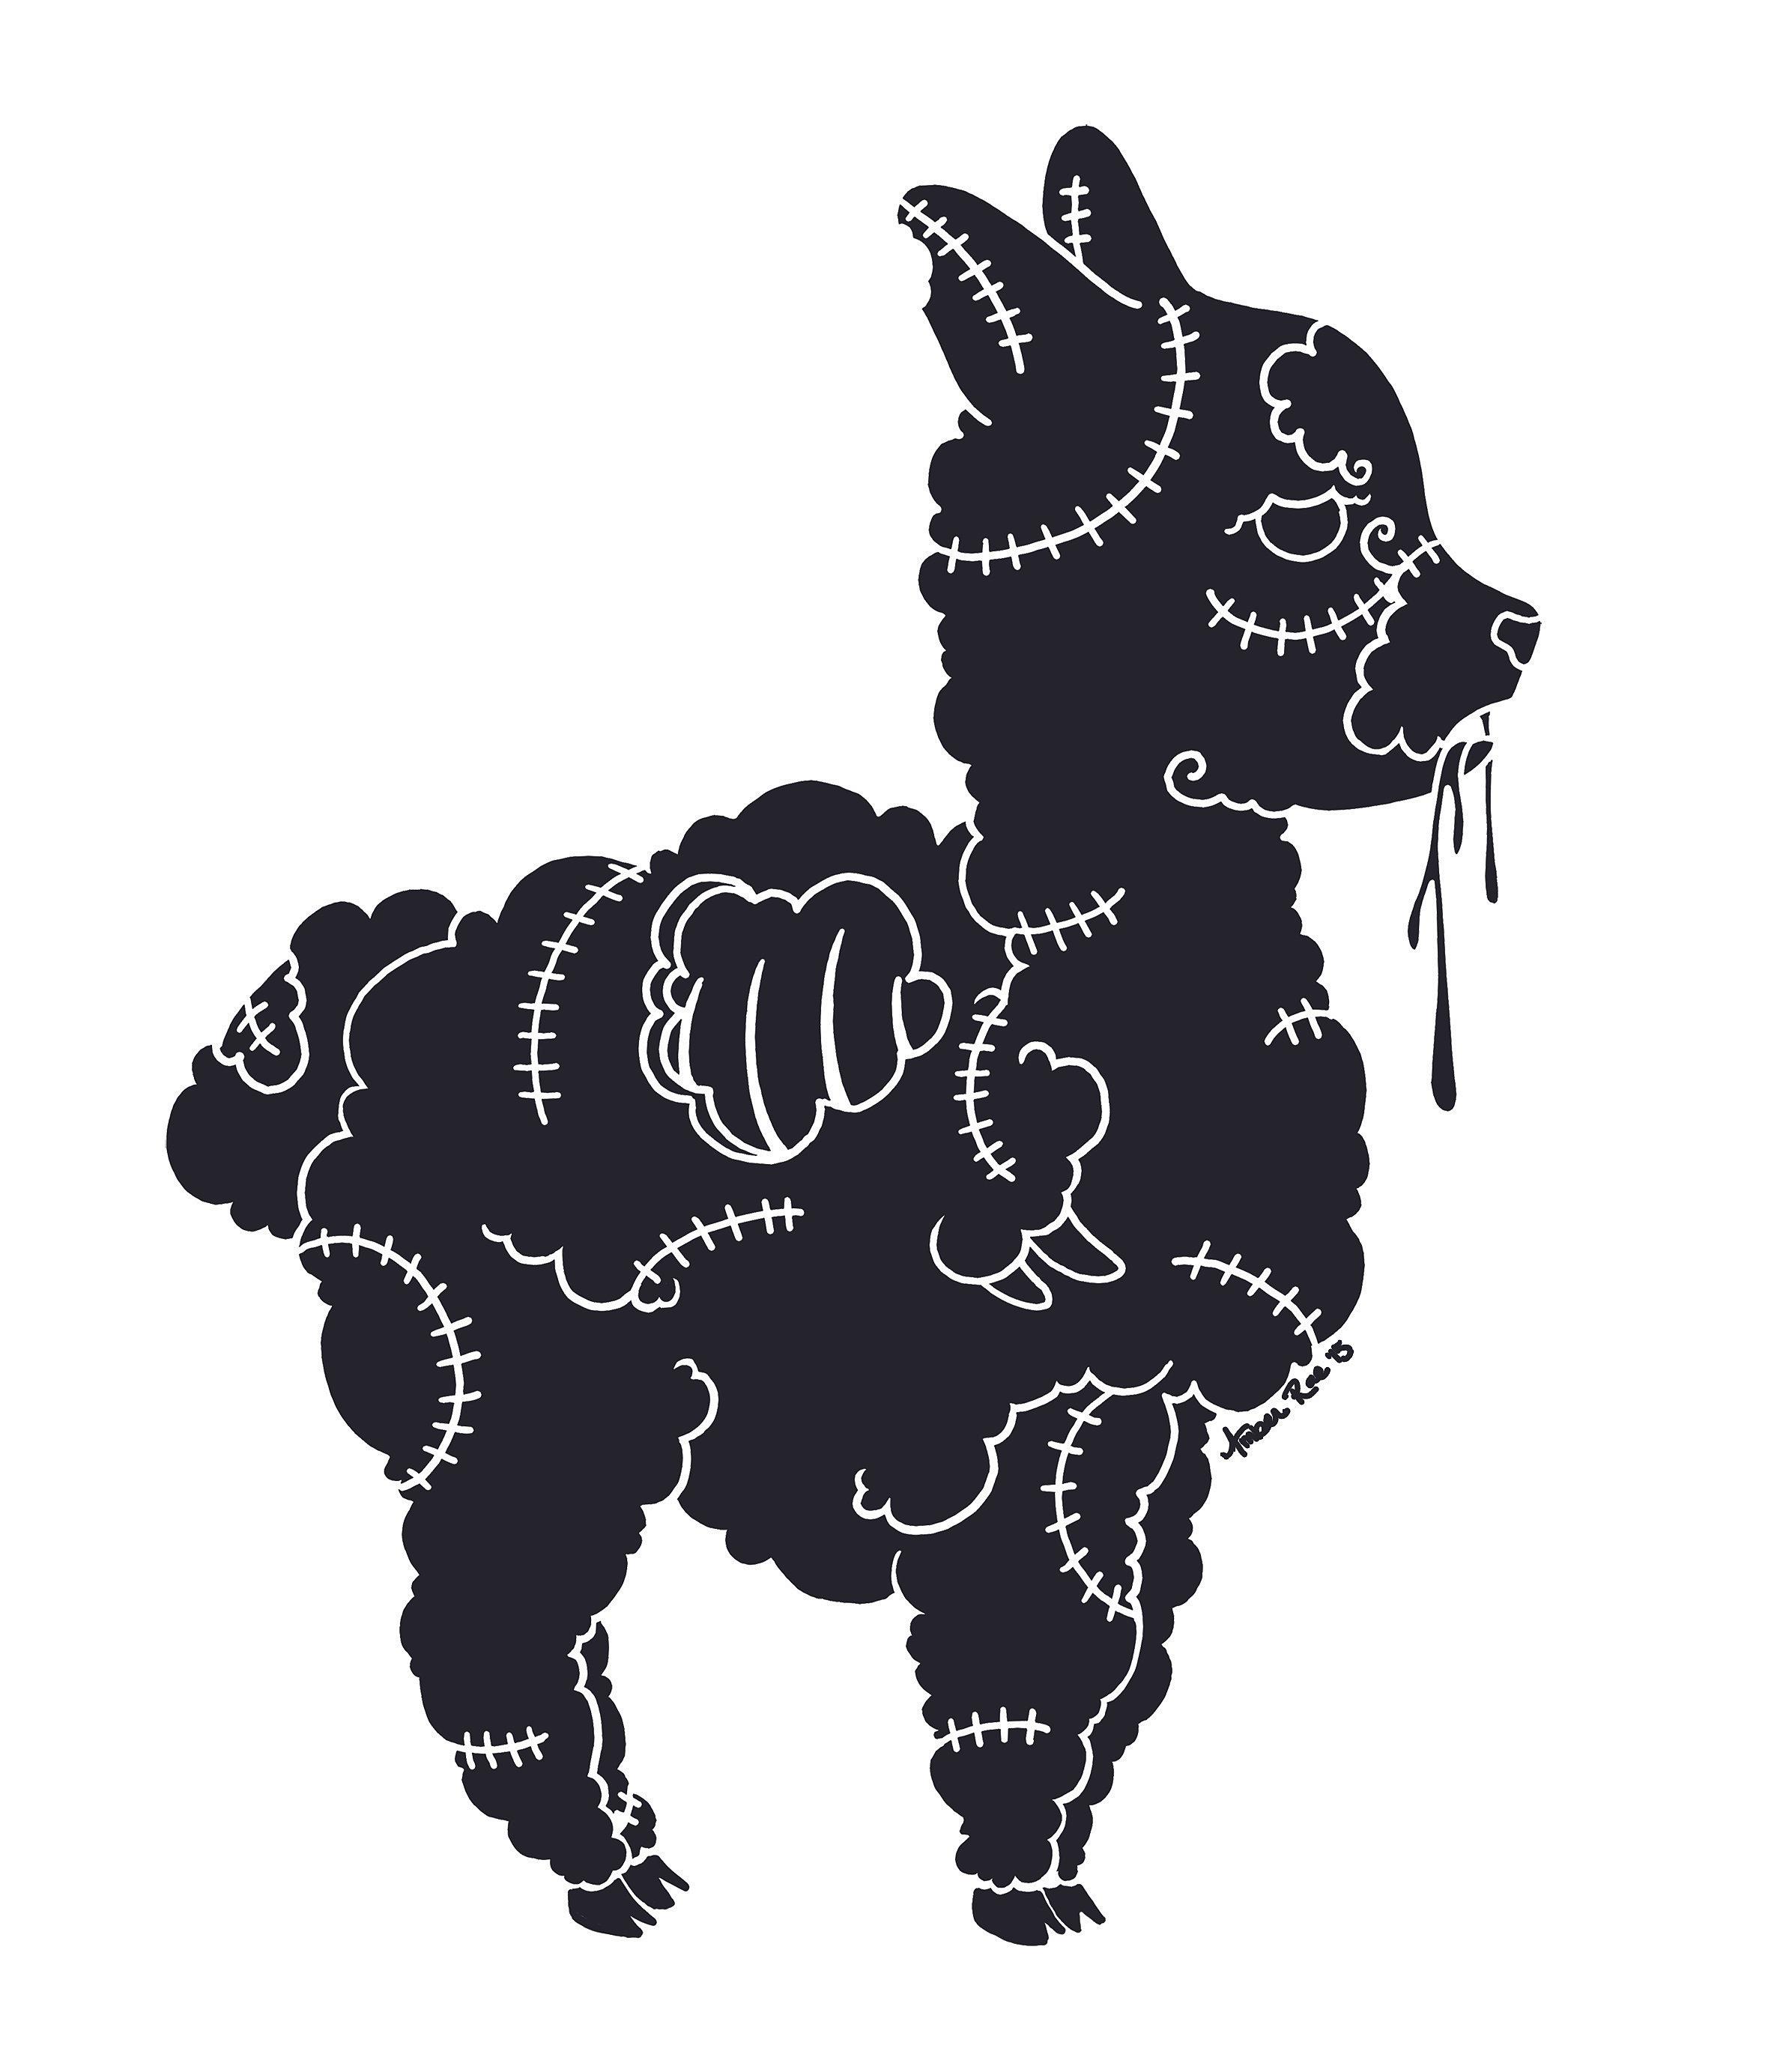 Design t shirt using photoshop - Zombie Alpaca Design Created Using Photoshop That Was Hand Printed Into A T Shirt At Aardvark Tees